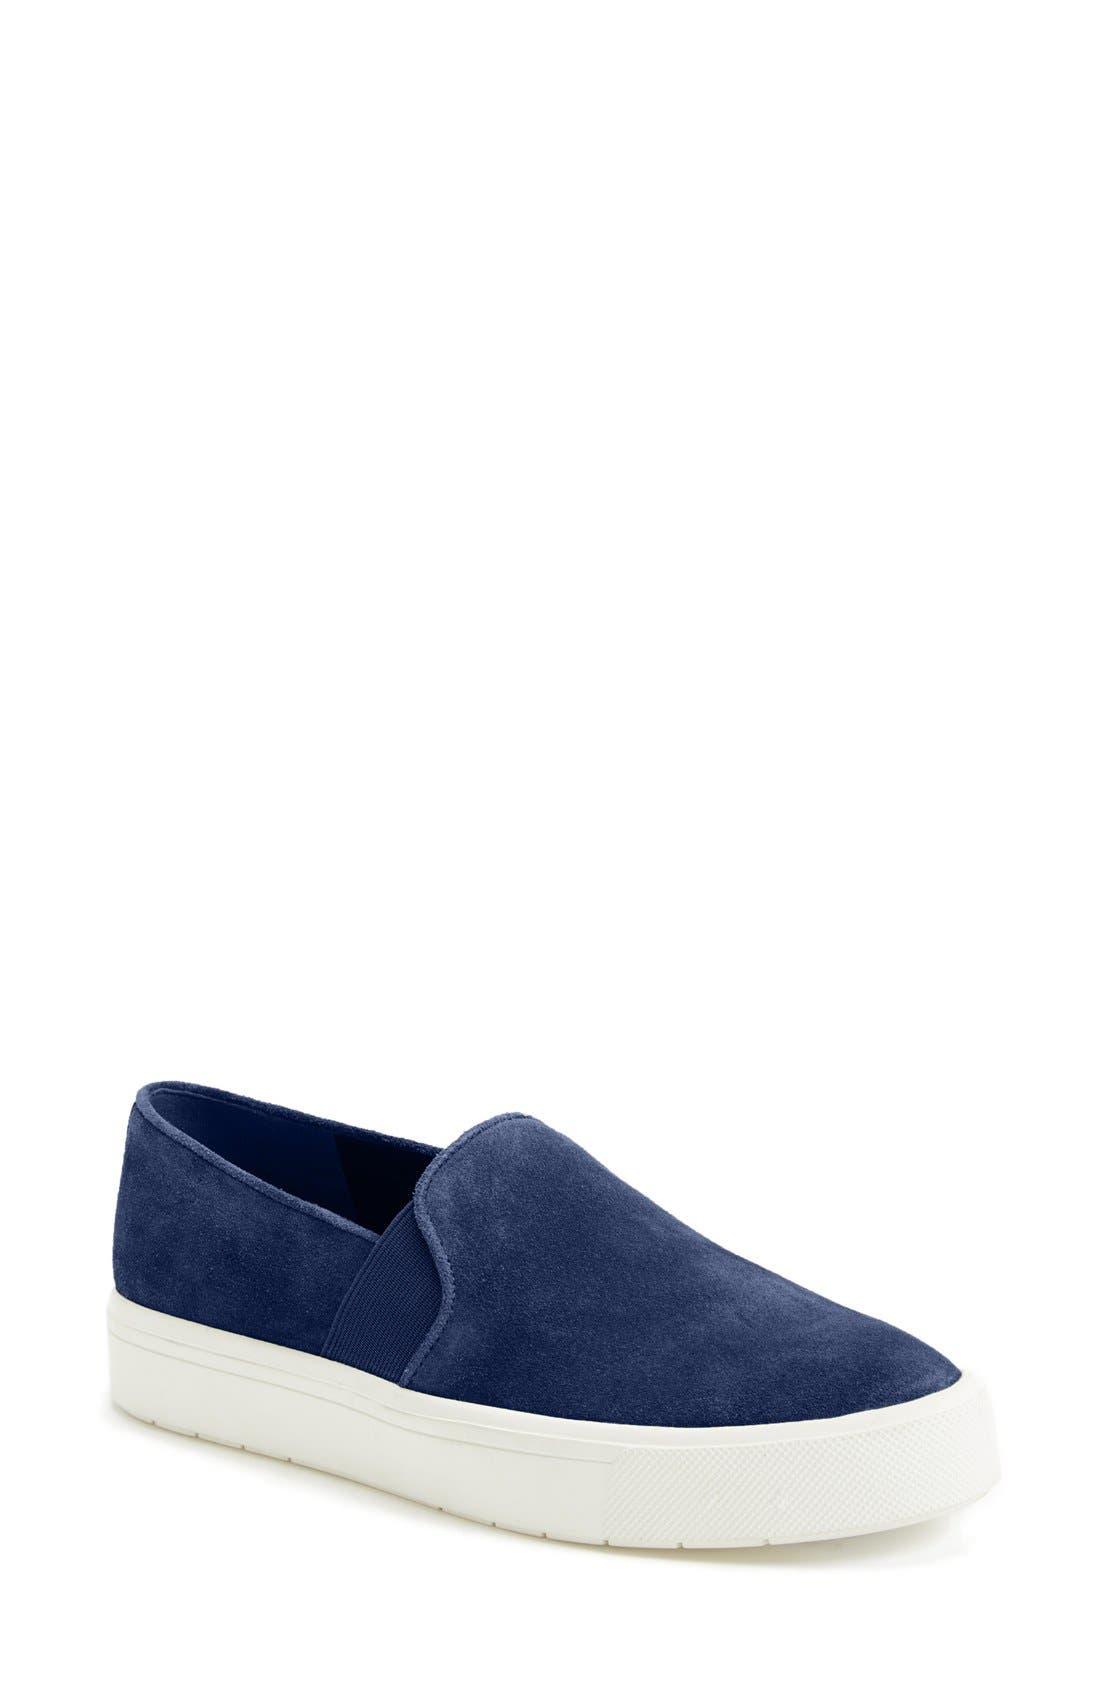 ,                             'Berlin 6' Slip-On Suede Sneaker,                             Main thumbnail 9, color,                             400